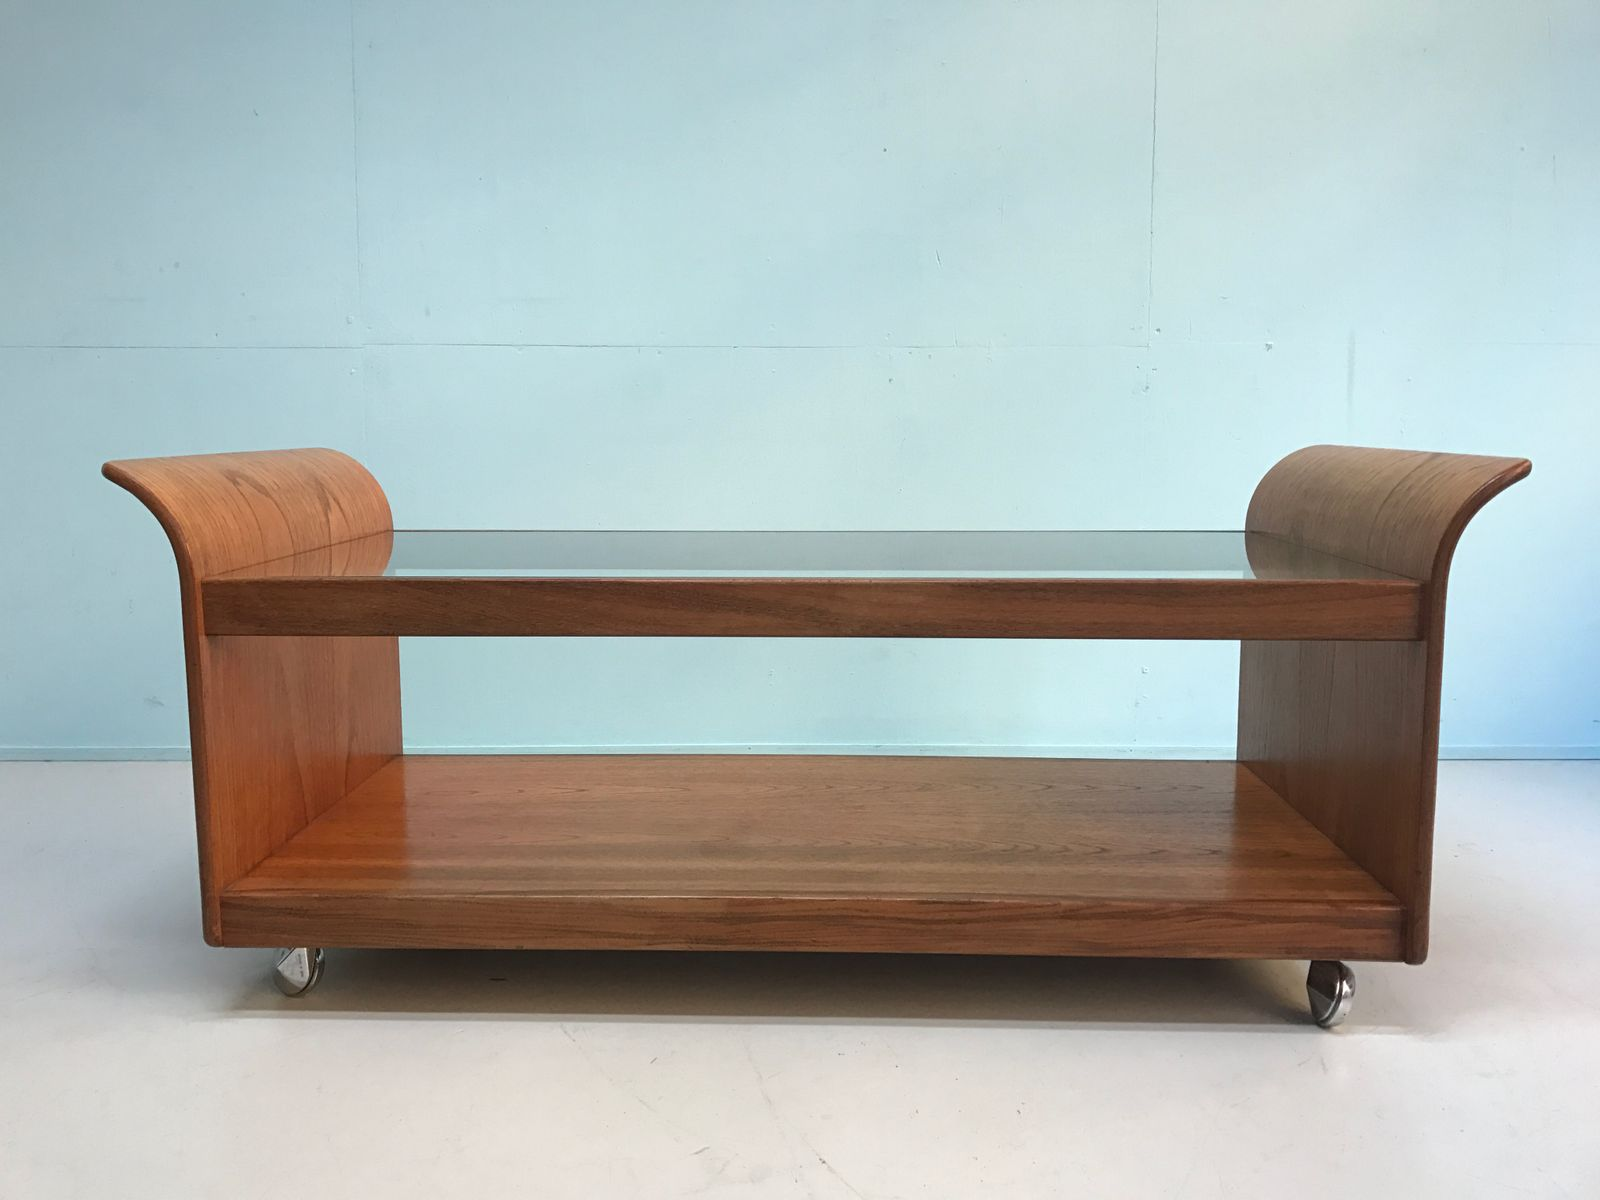 Teak And Glass Coffee Table Mid Century Coffee Table In Teak And Glass For Sale At Pamono